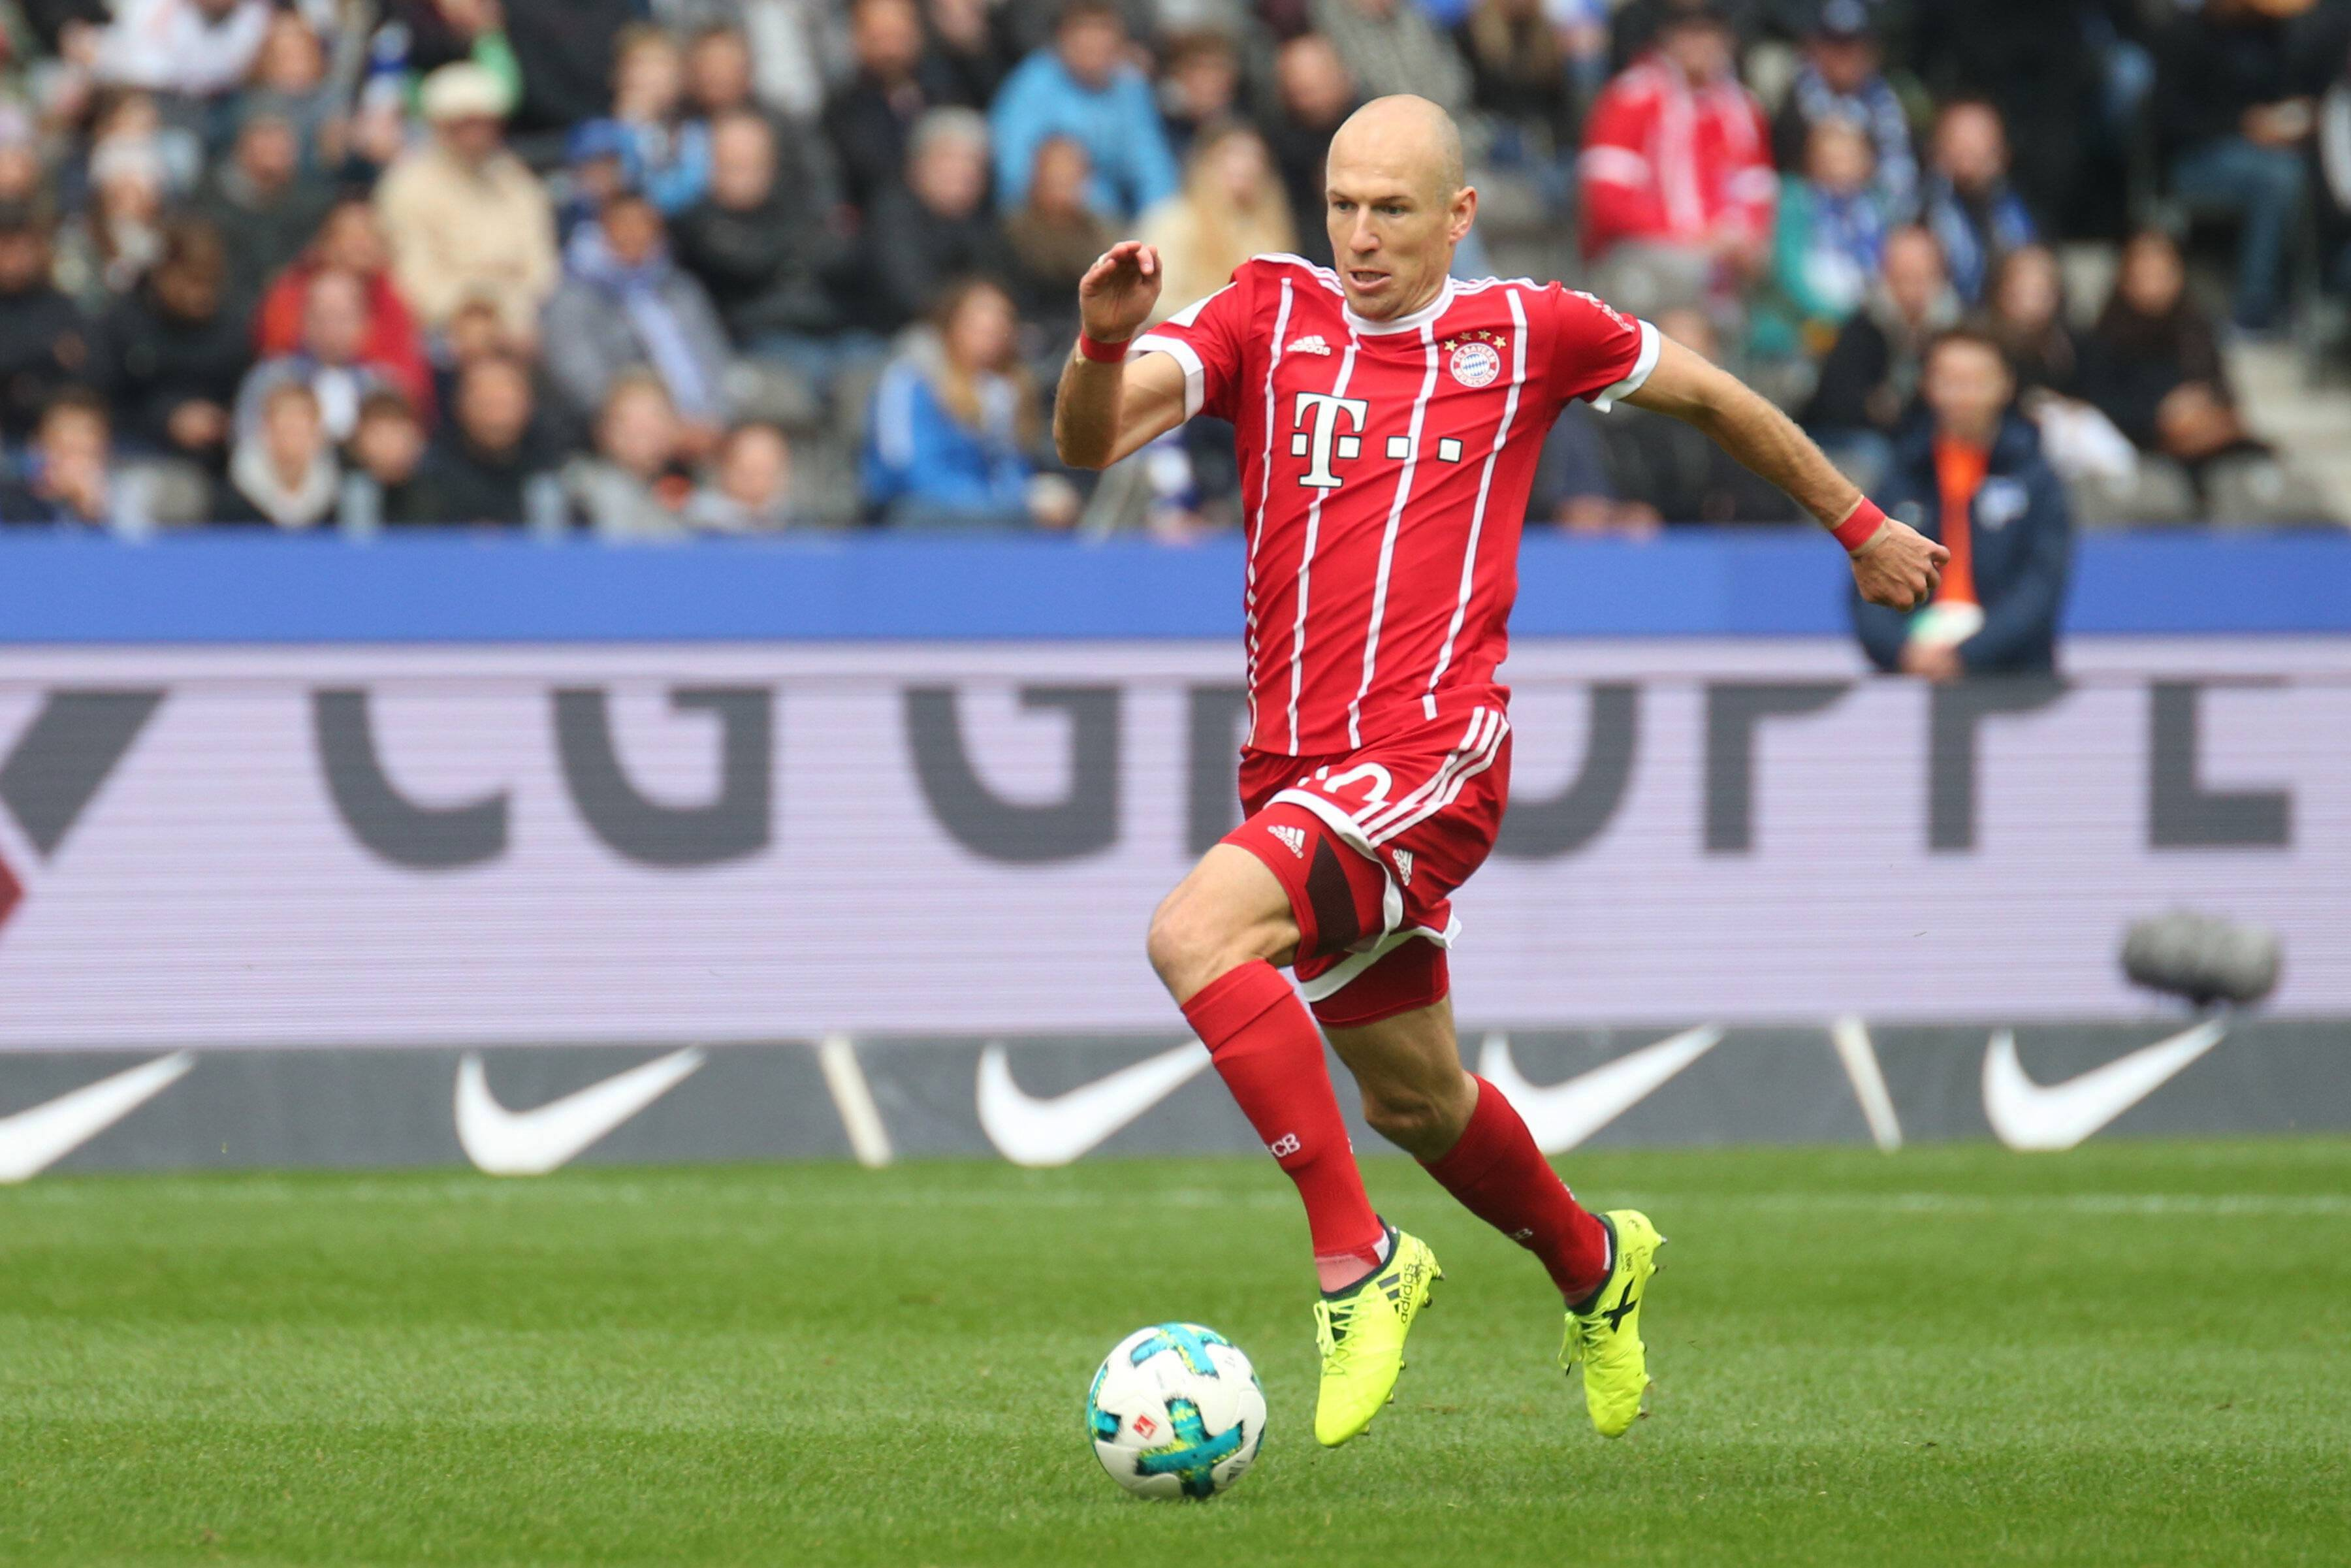 Football - Etranger - Bundesliga : Hambourg-Bayern Munich en direct